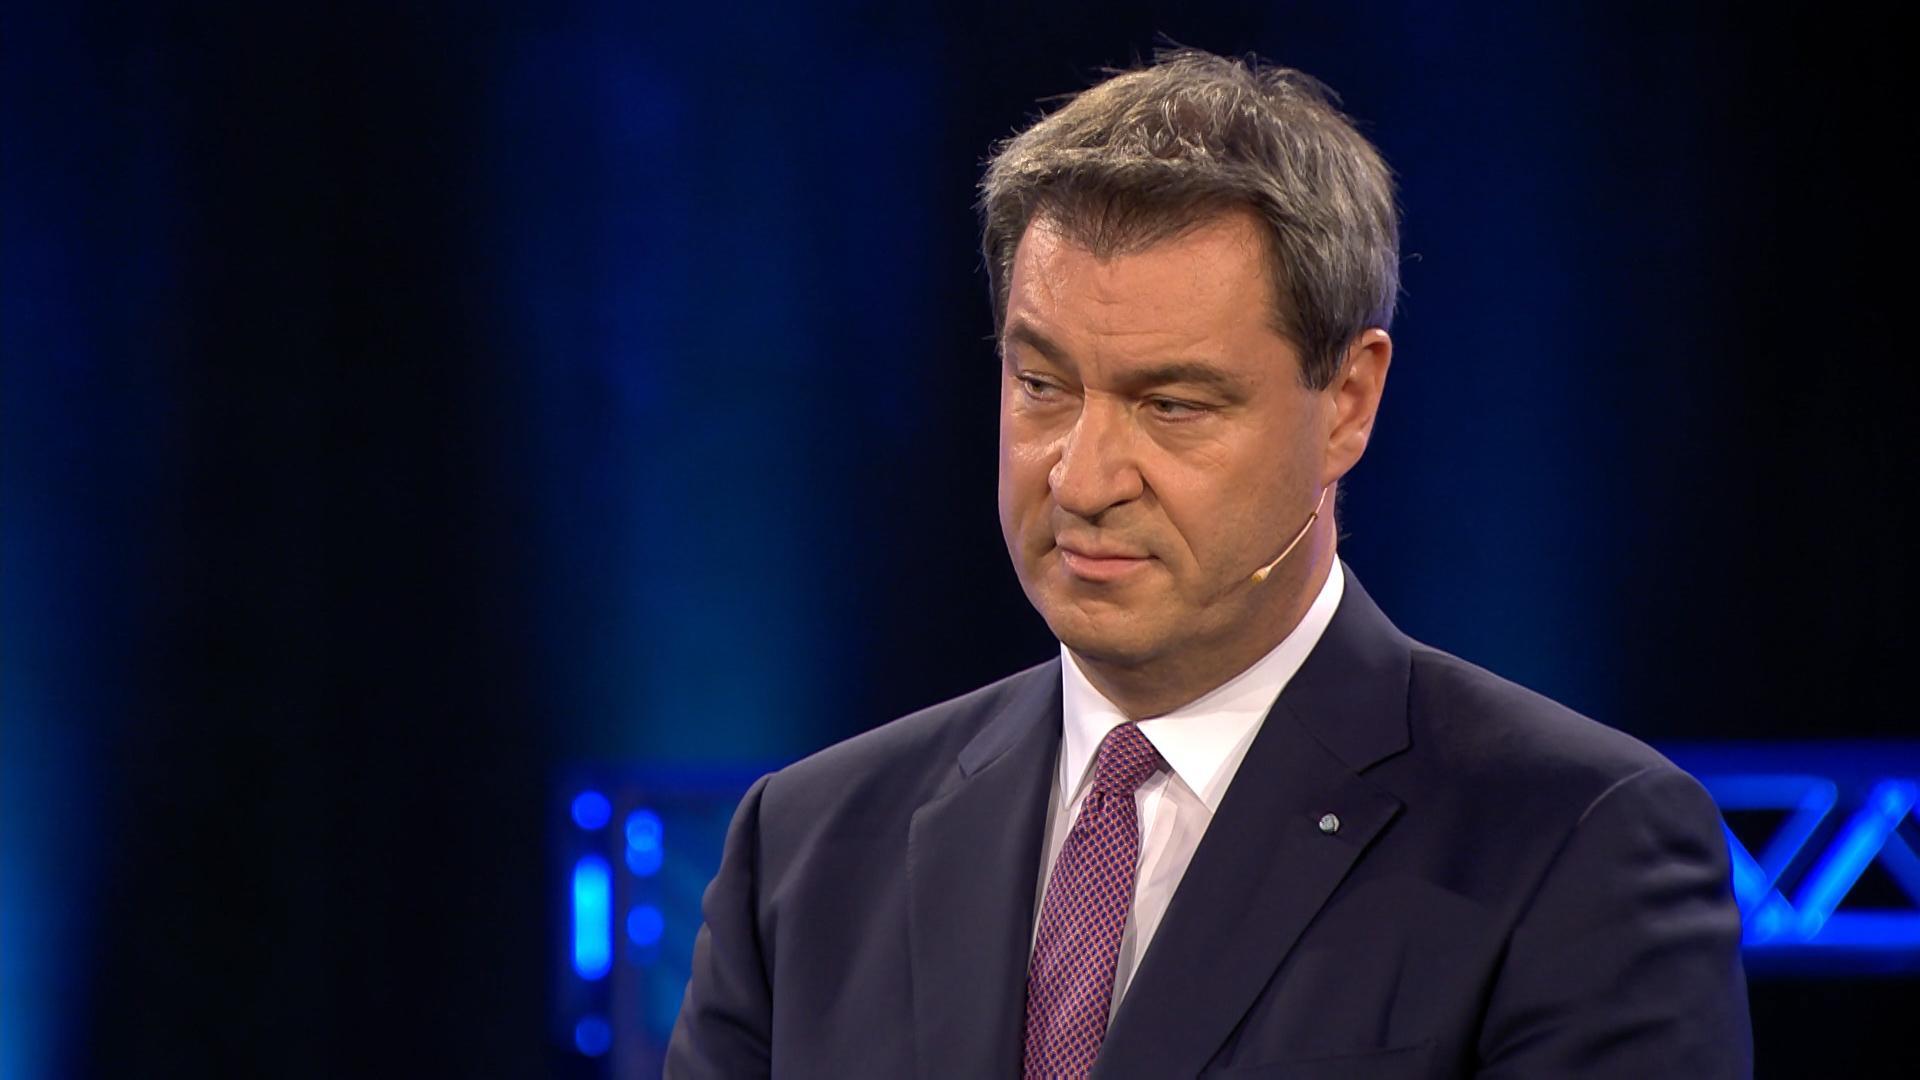 Ministerpräsident Markus Söder in der BR Wahlarena